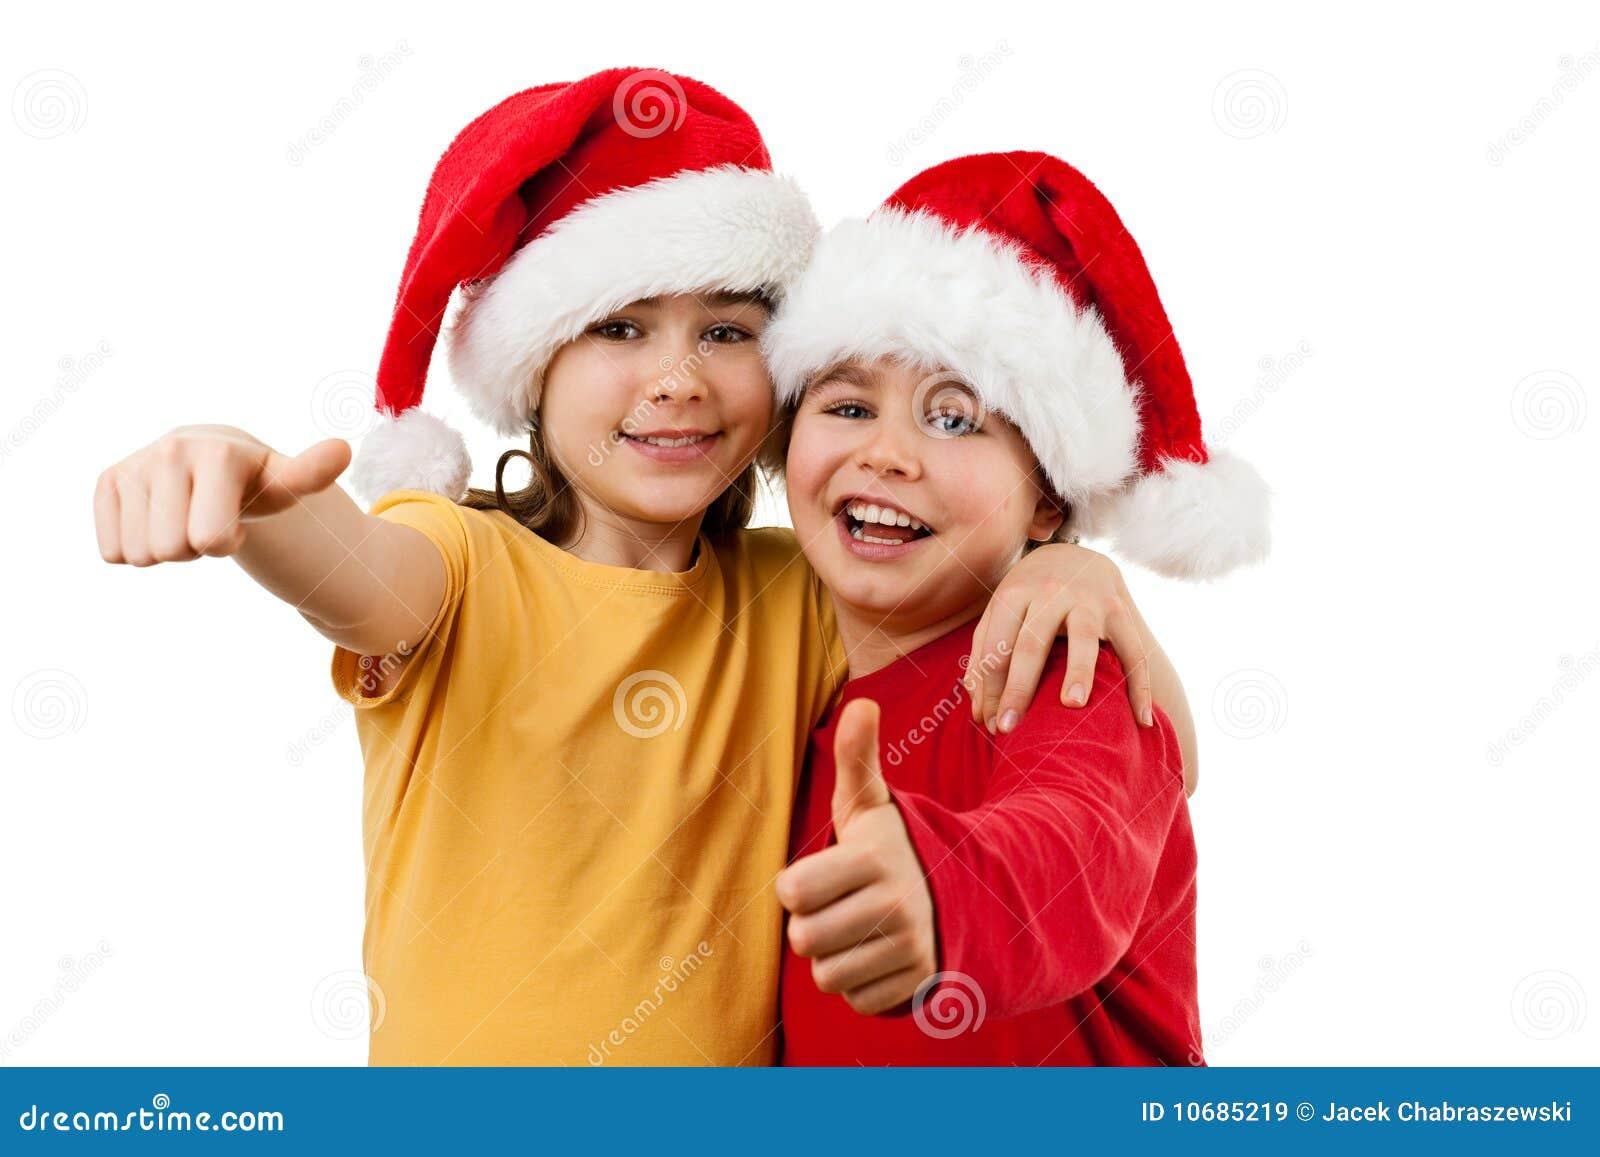 santa claus kids ok sign - Santa Claus Kids